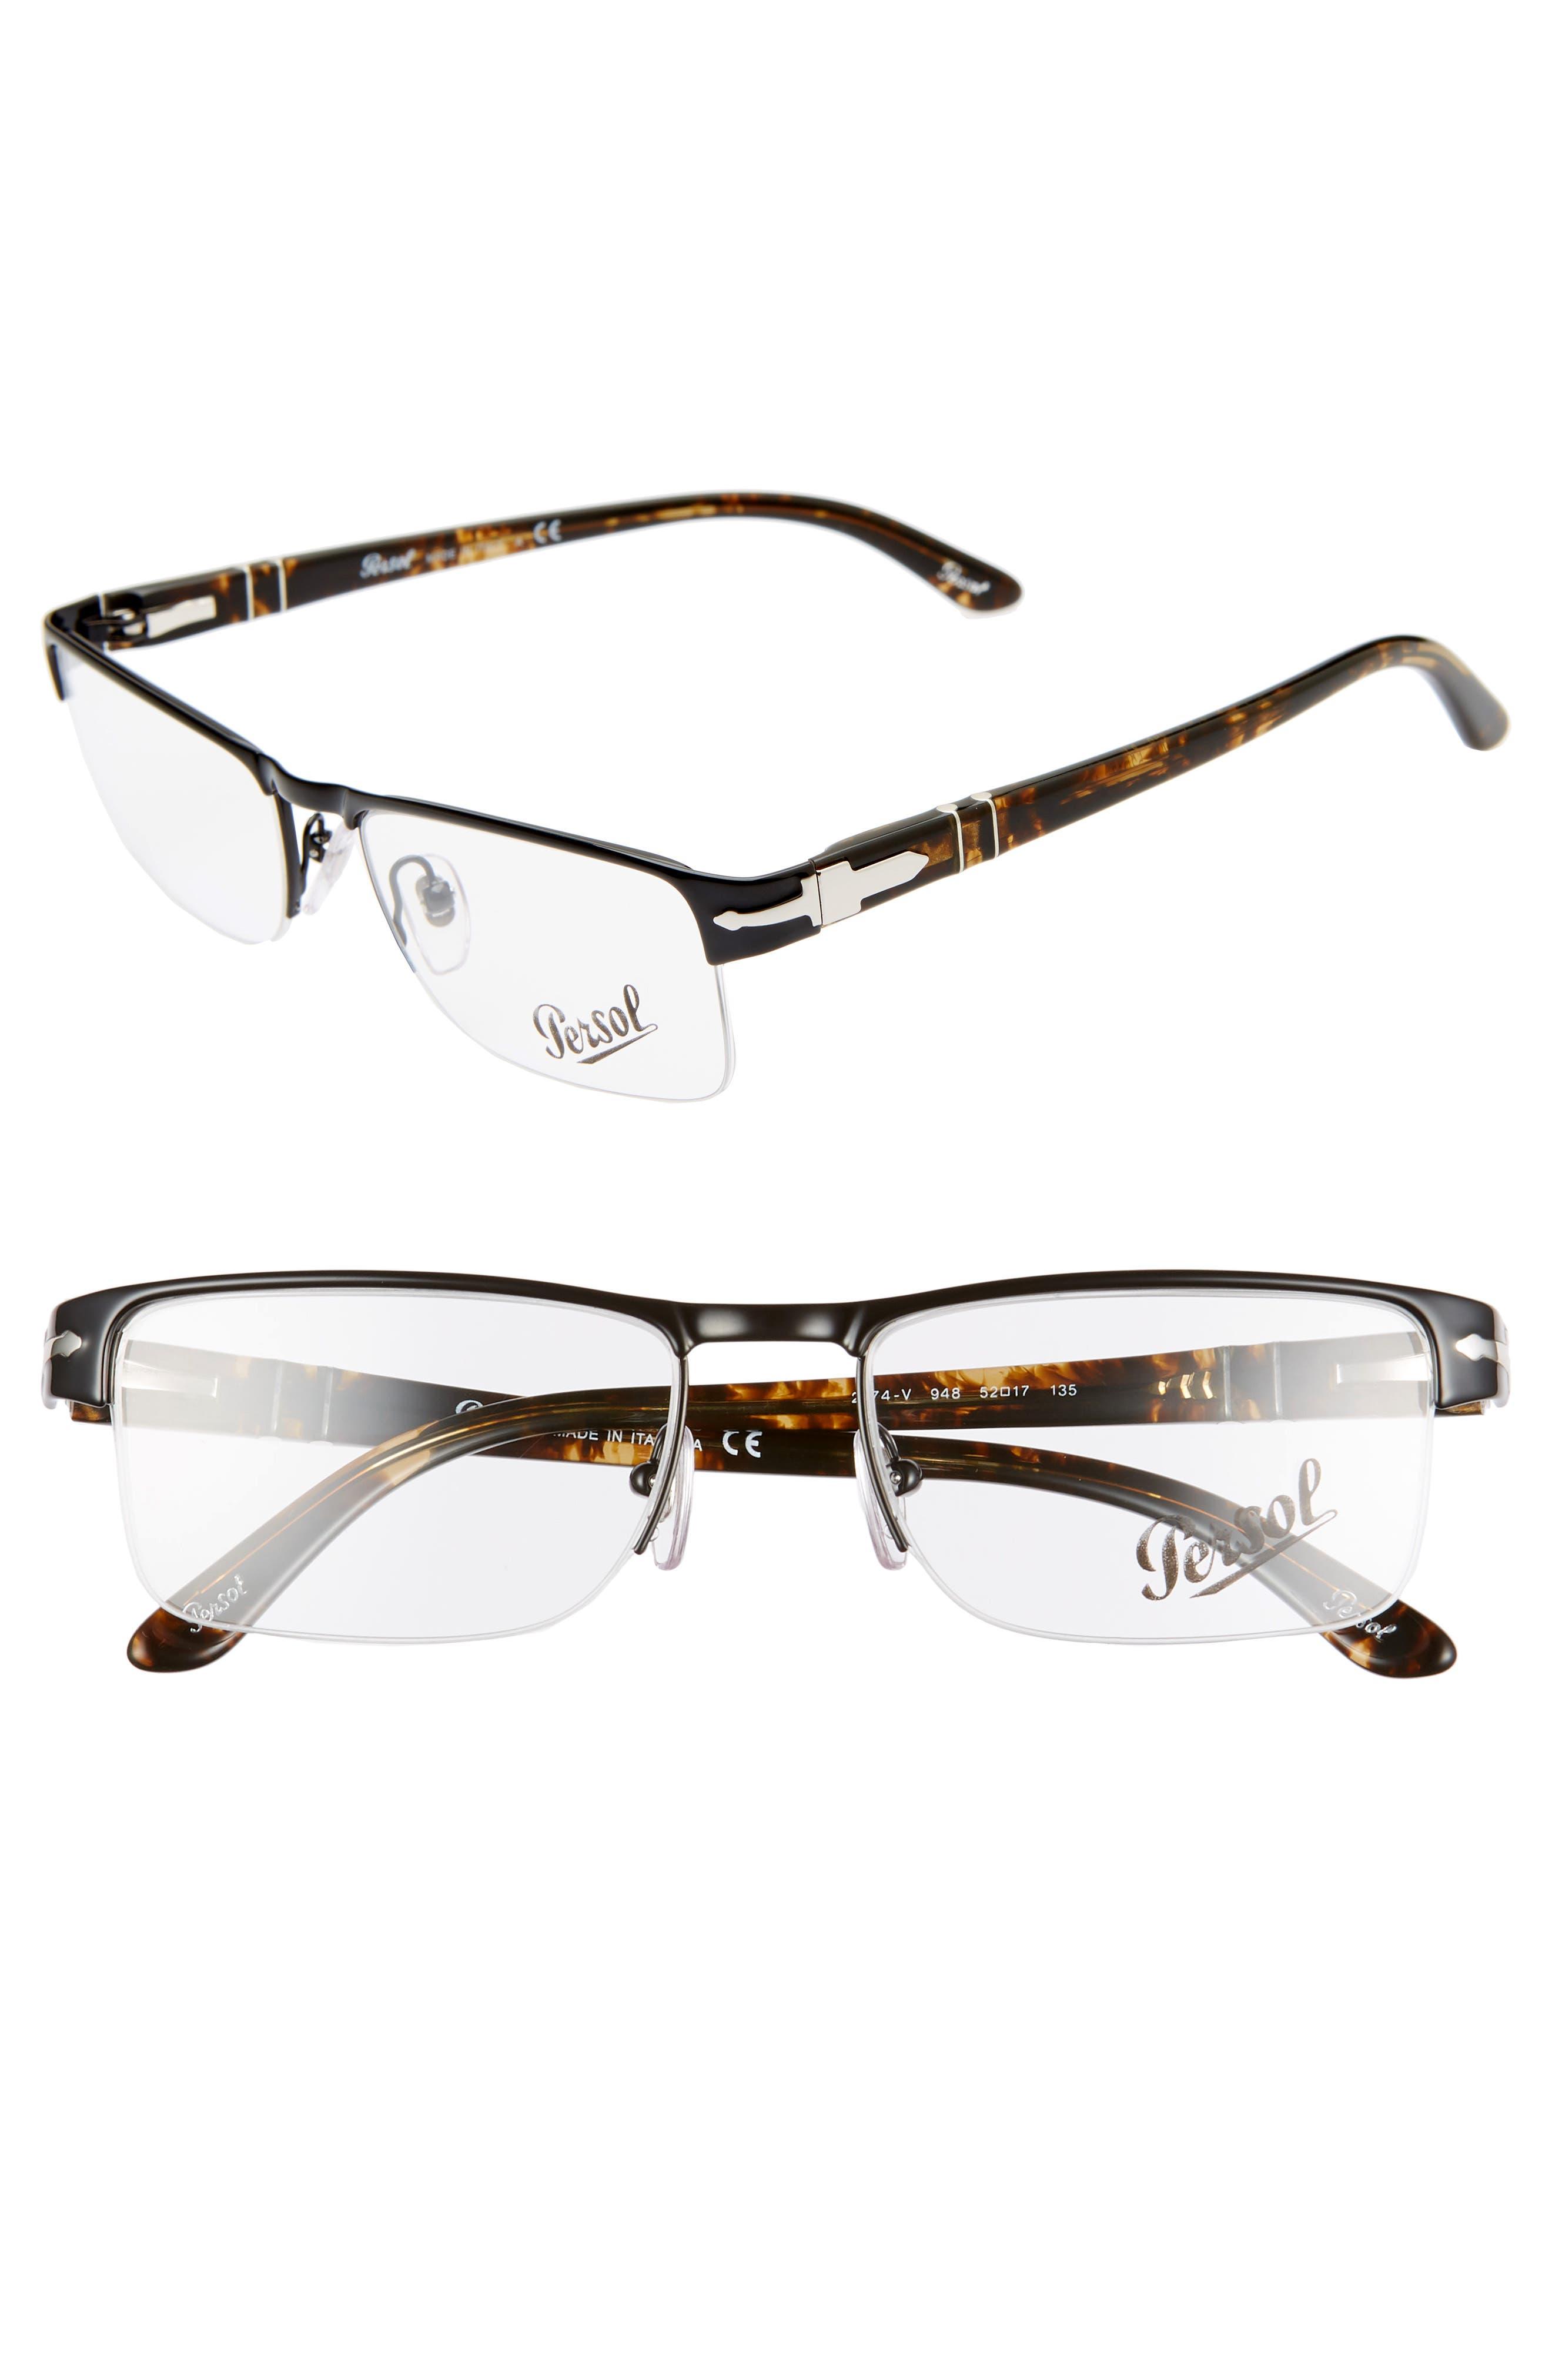 9ca3990b38eb Men s Optical Frames Sunglasses   Eyeglasses